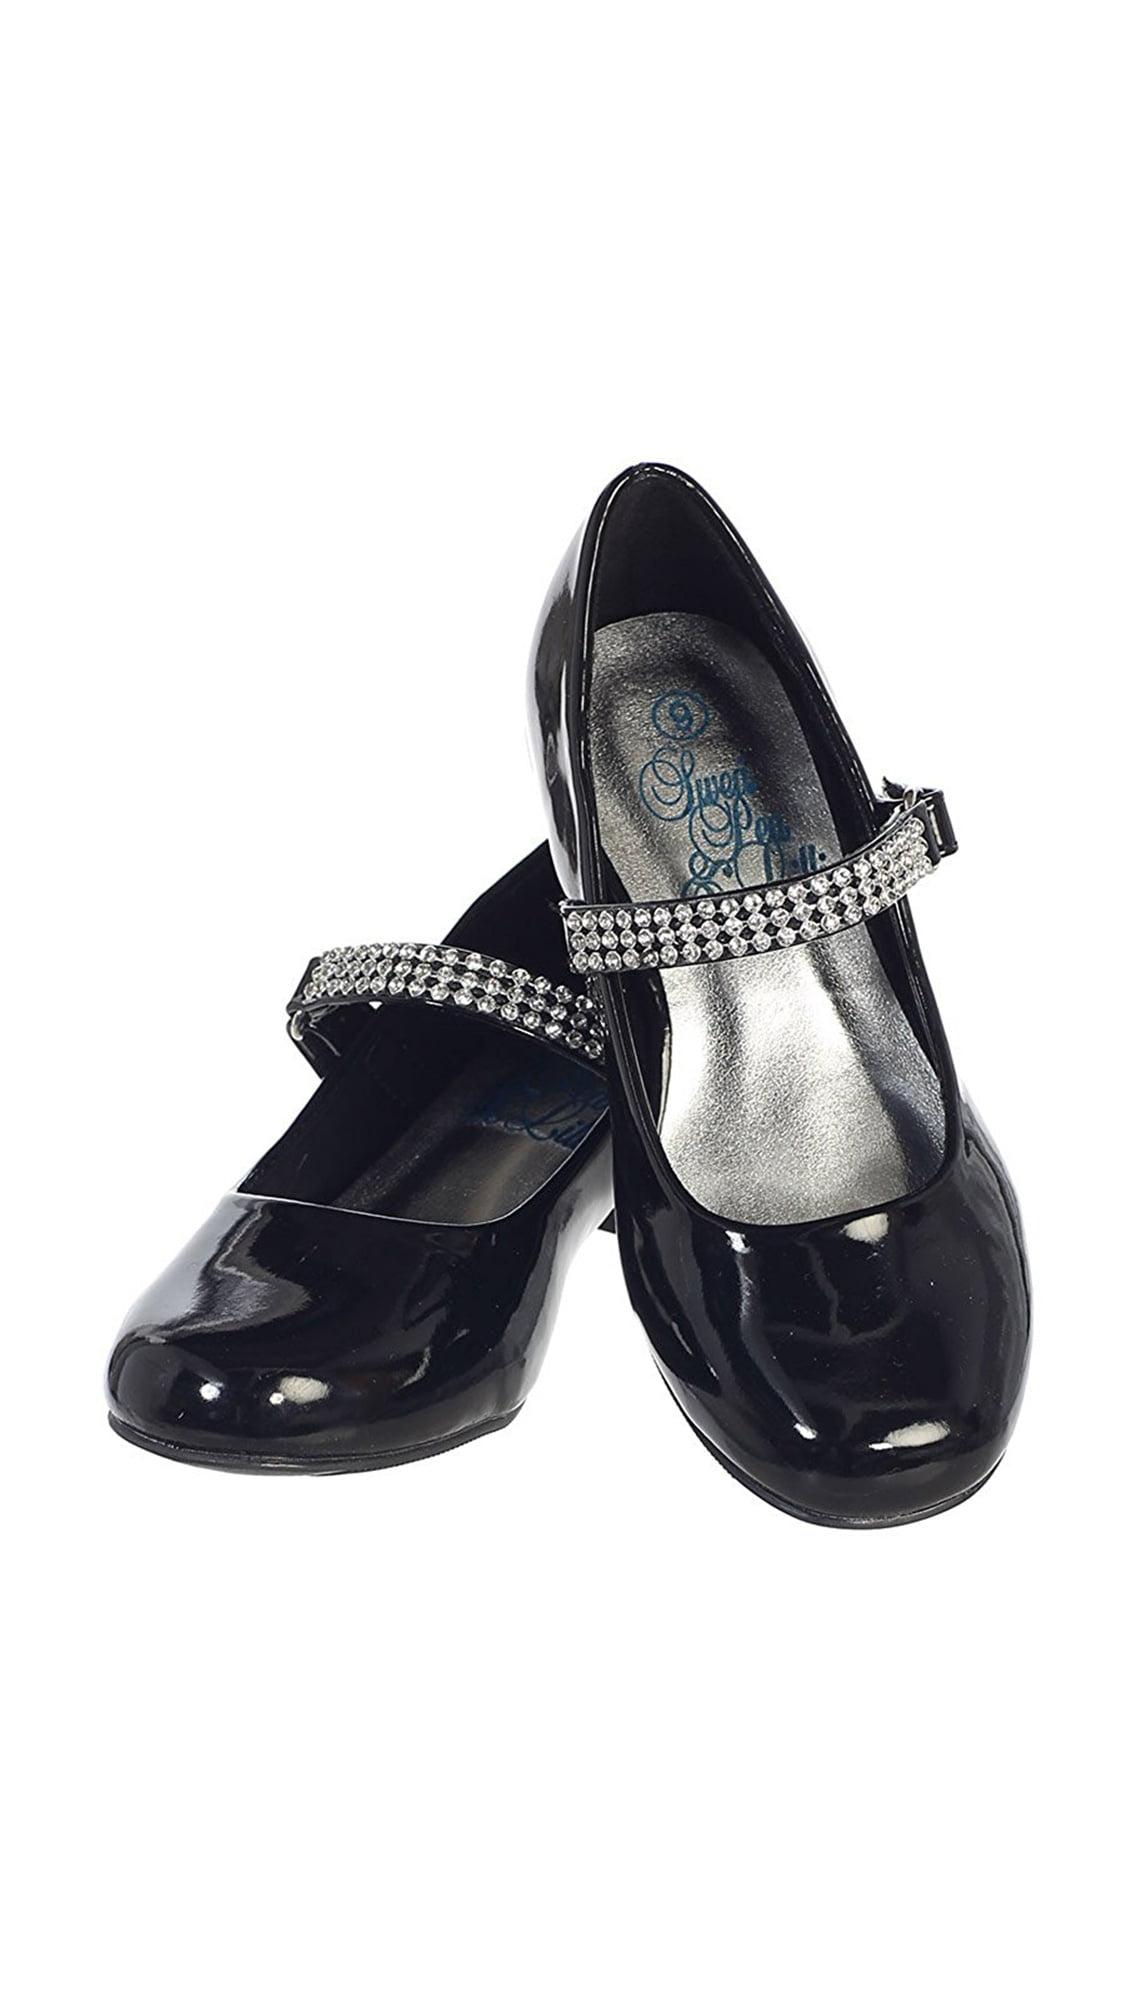 Off-White Girls Dress Shoes - Walmart.com